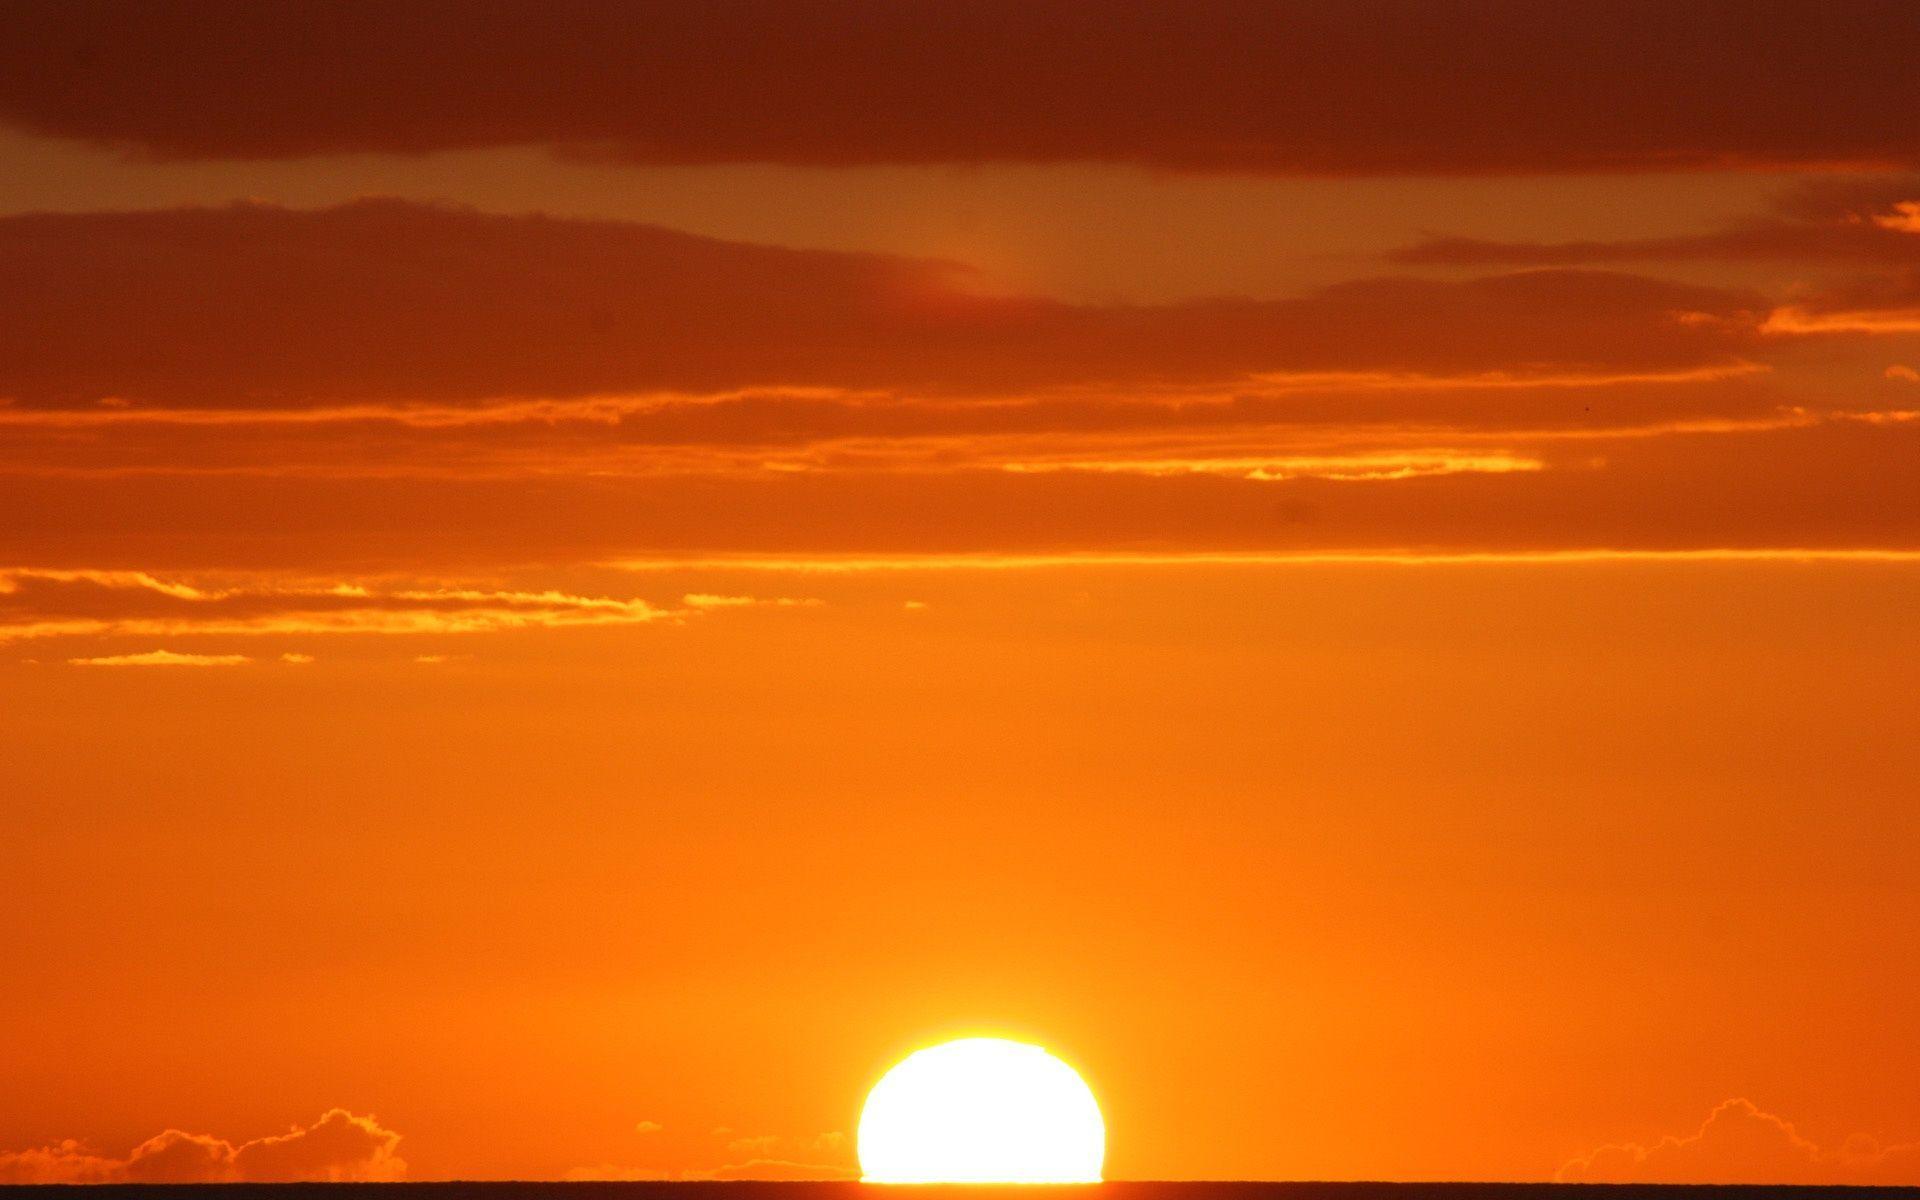 1920x1200 Hình nền mặt trời mọc, Nền mặt trời mọc, Sự trỗi dậy